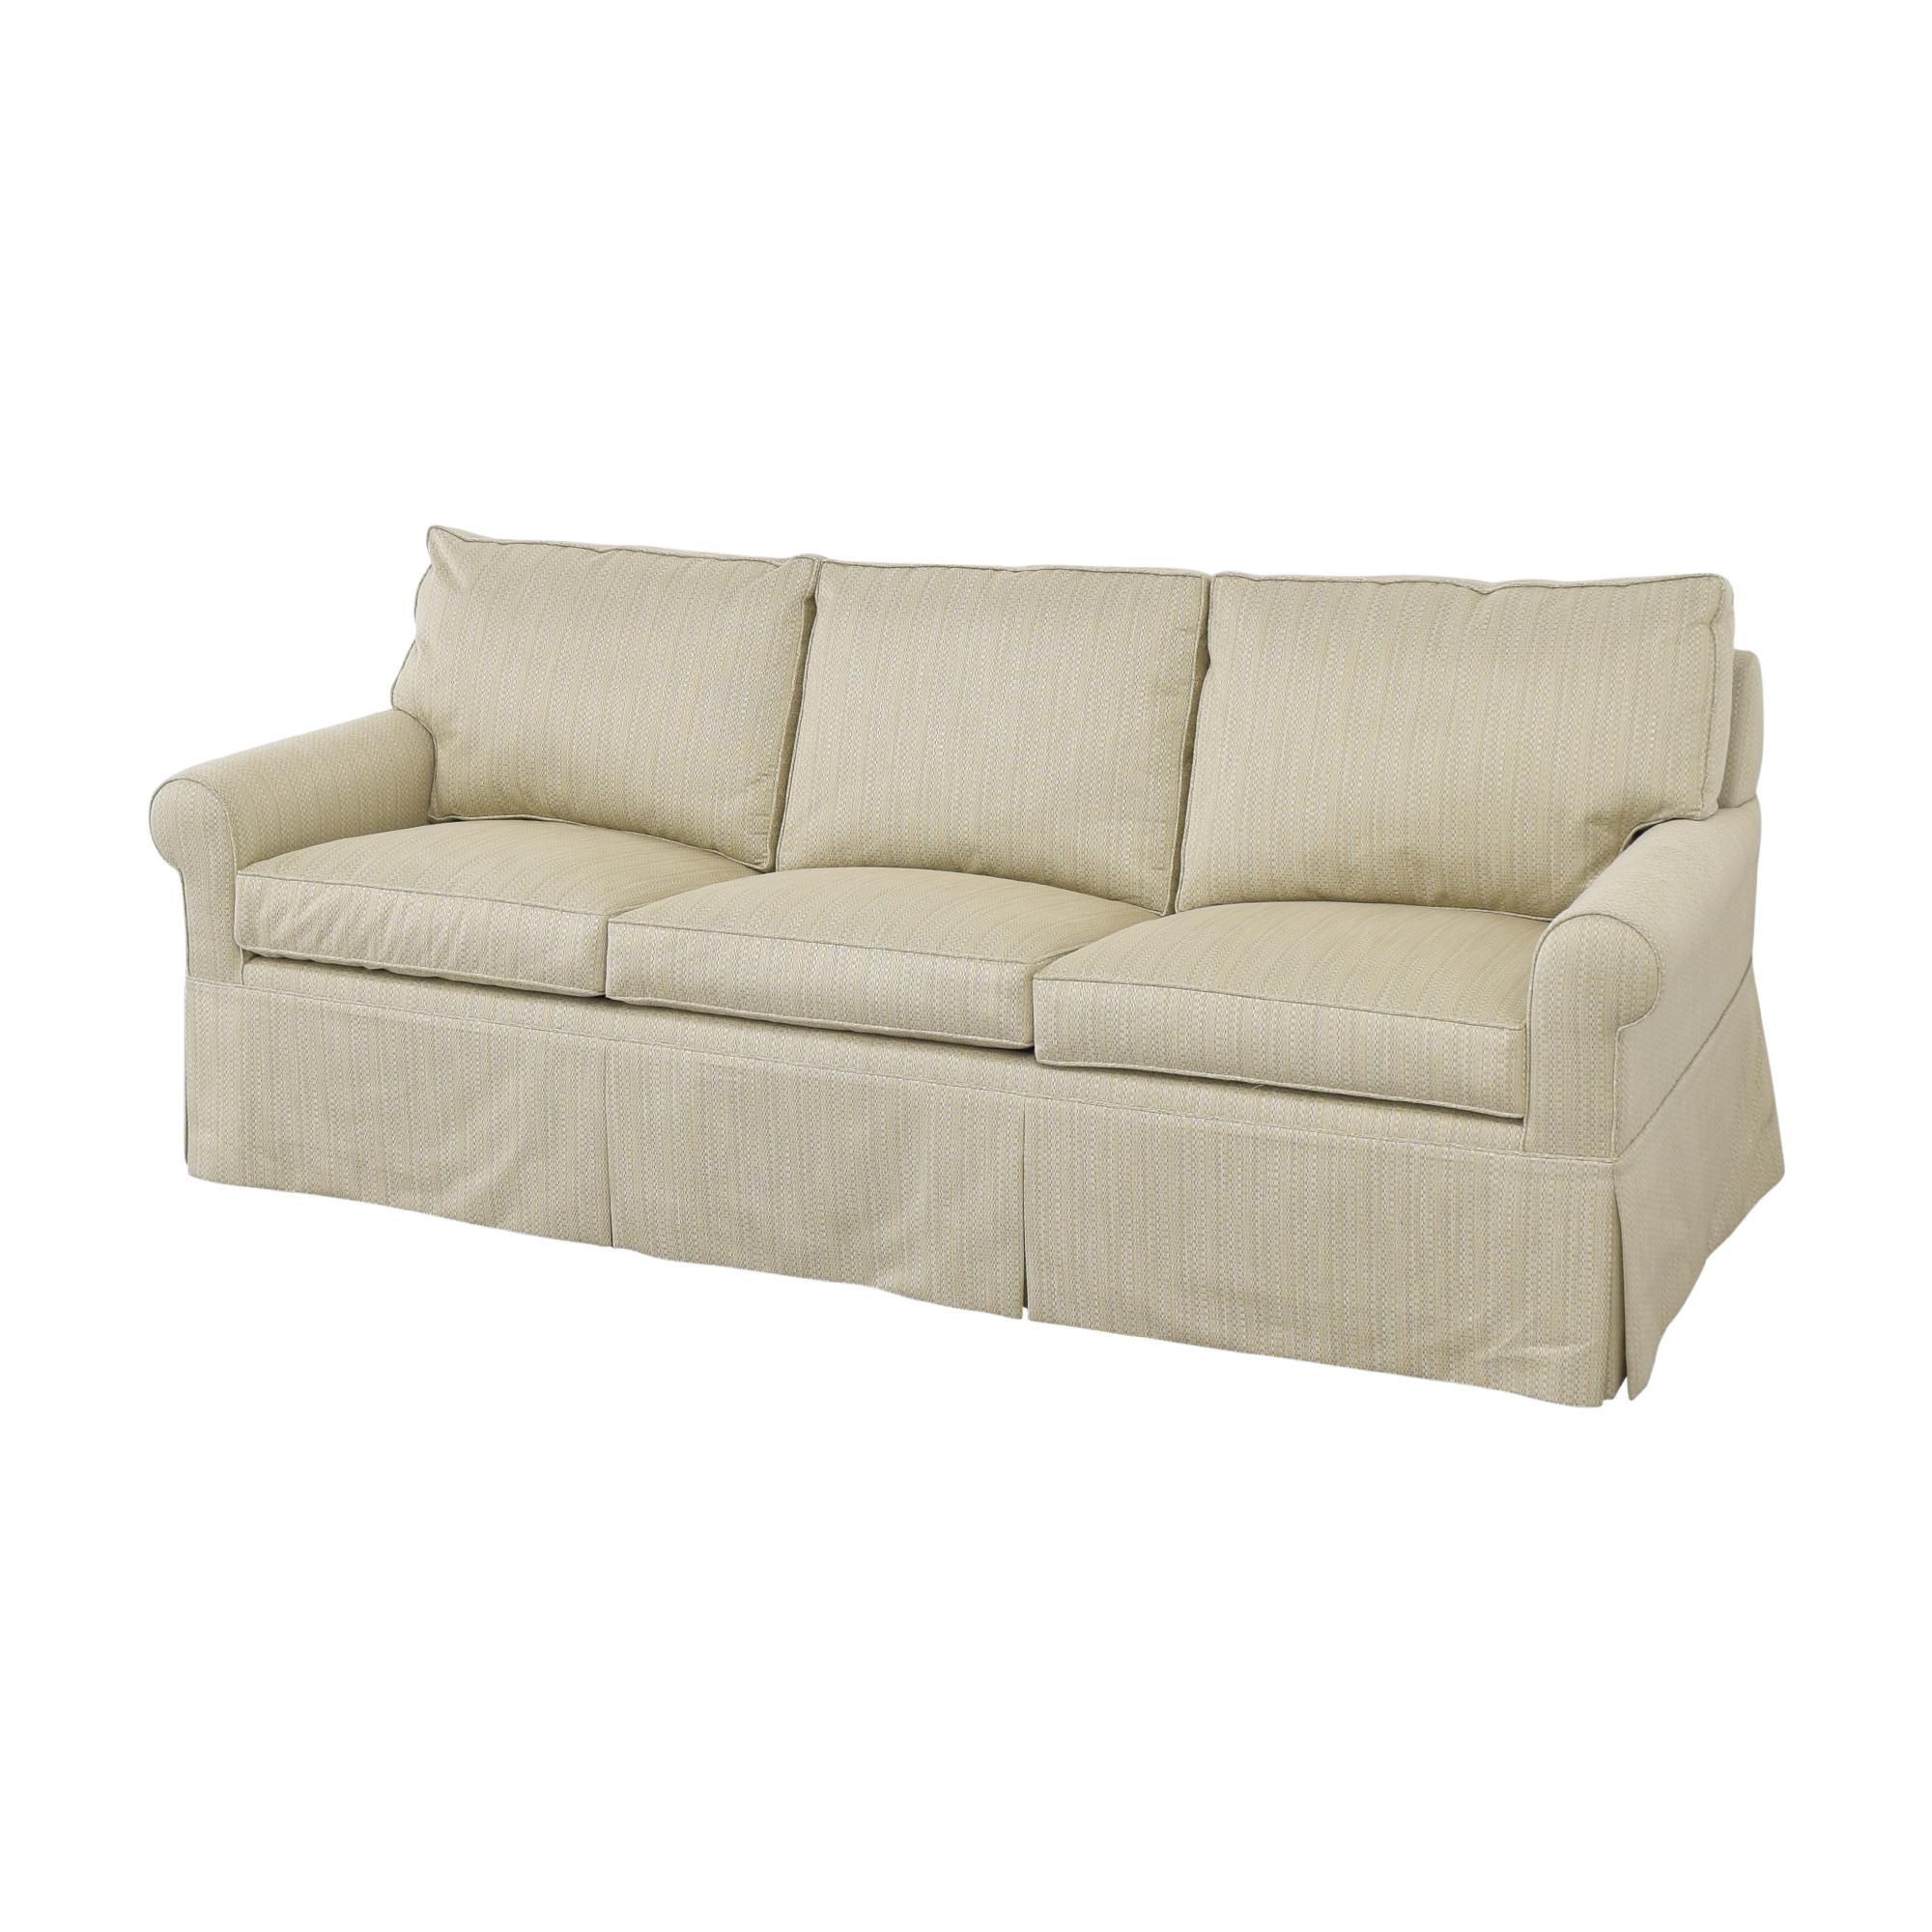 Carlyle Sleeper Sofa sale